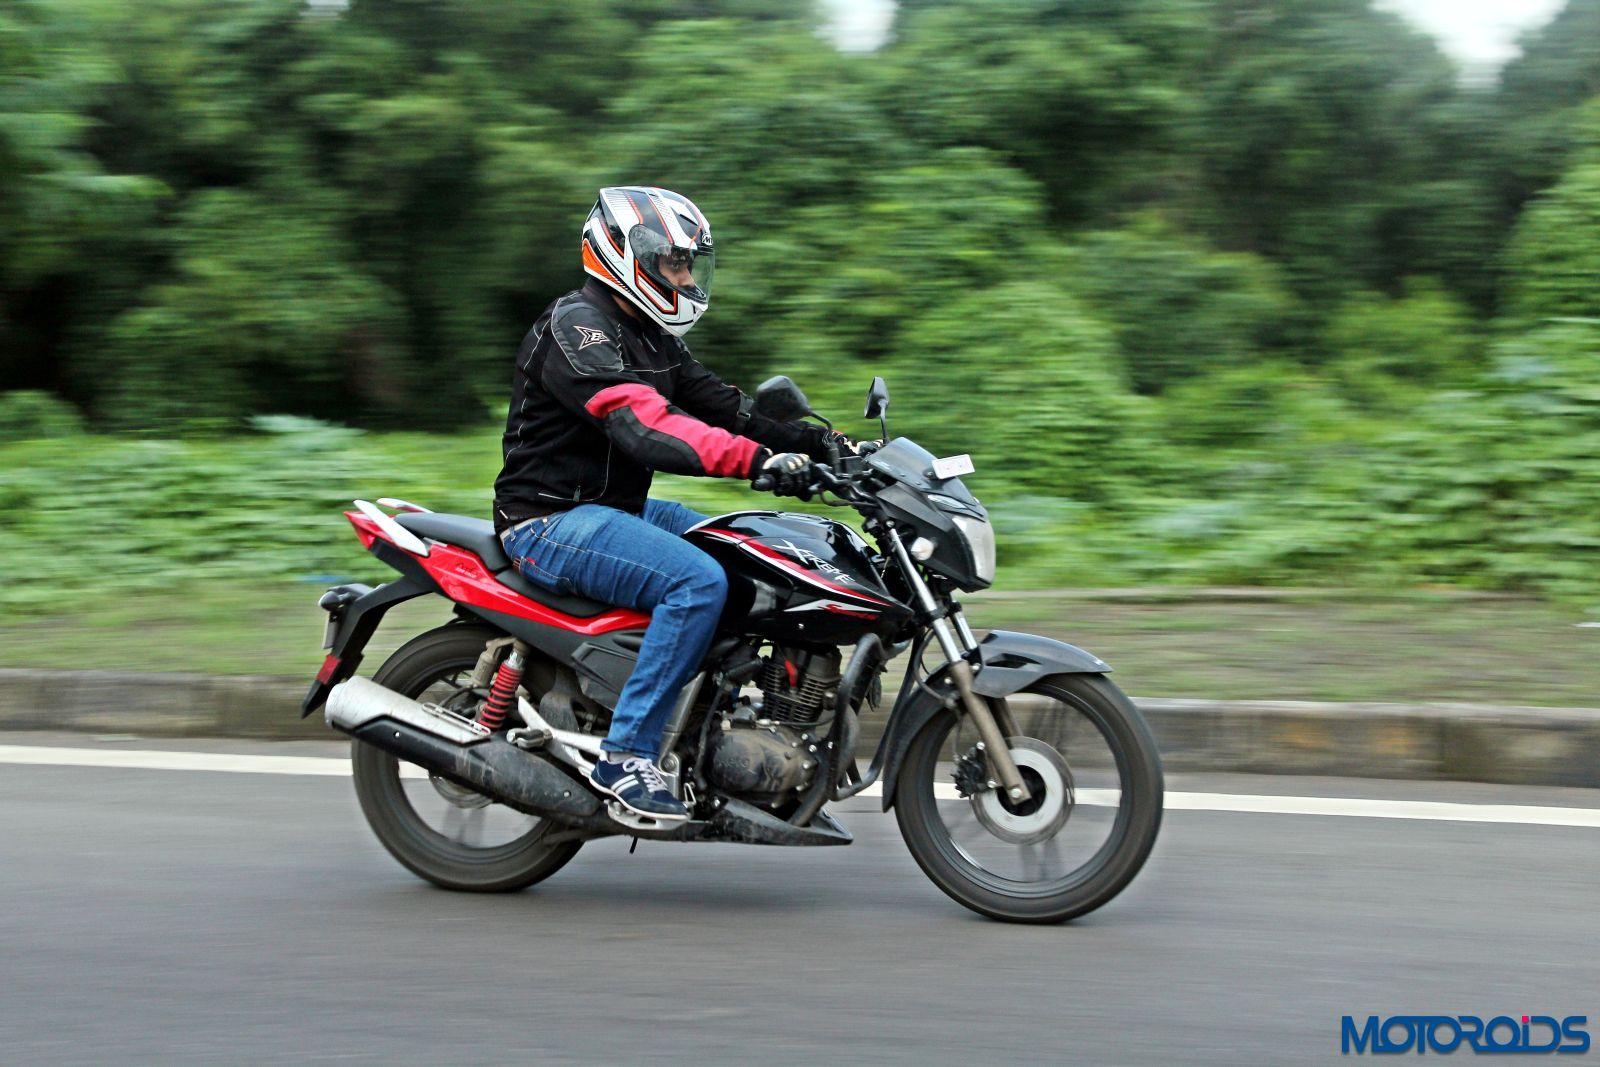 New 2015 Hero Xtreme Sports Review Snazzy Step Up Motoroids Keihin Cv Carburetor Diagram Moreover In